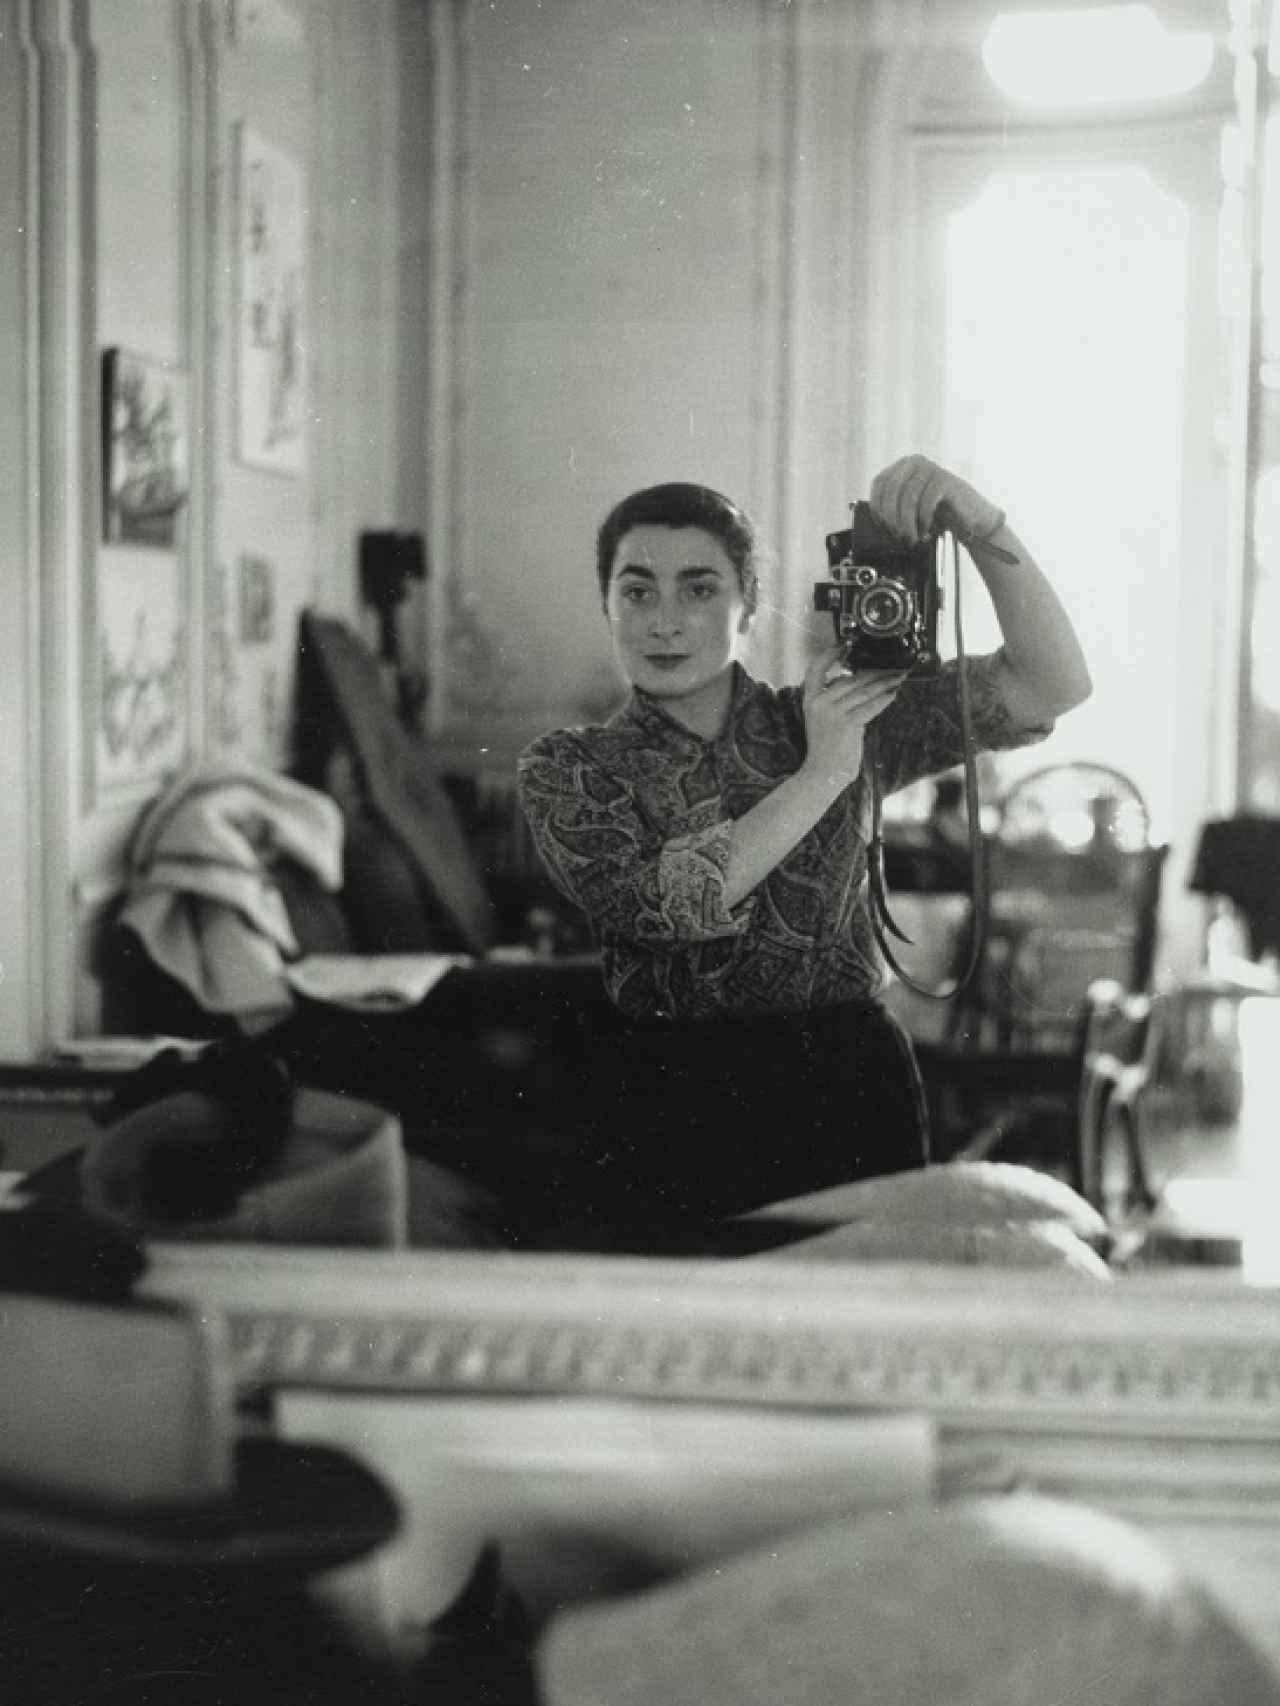 Autorretrato de Jacqueline, en Cannes, 1956.